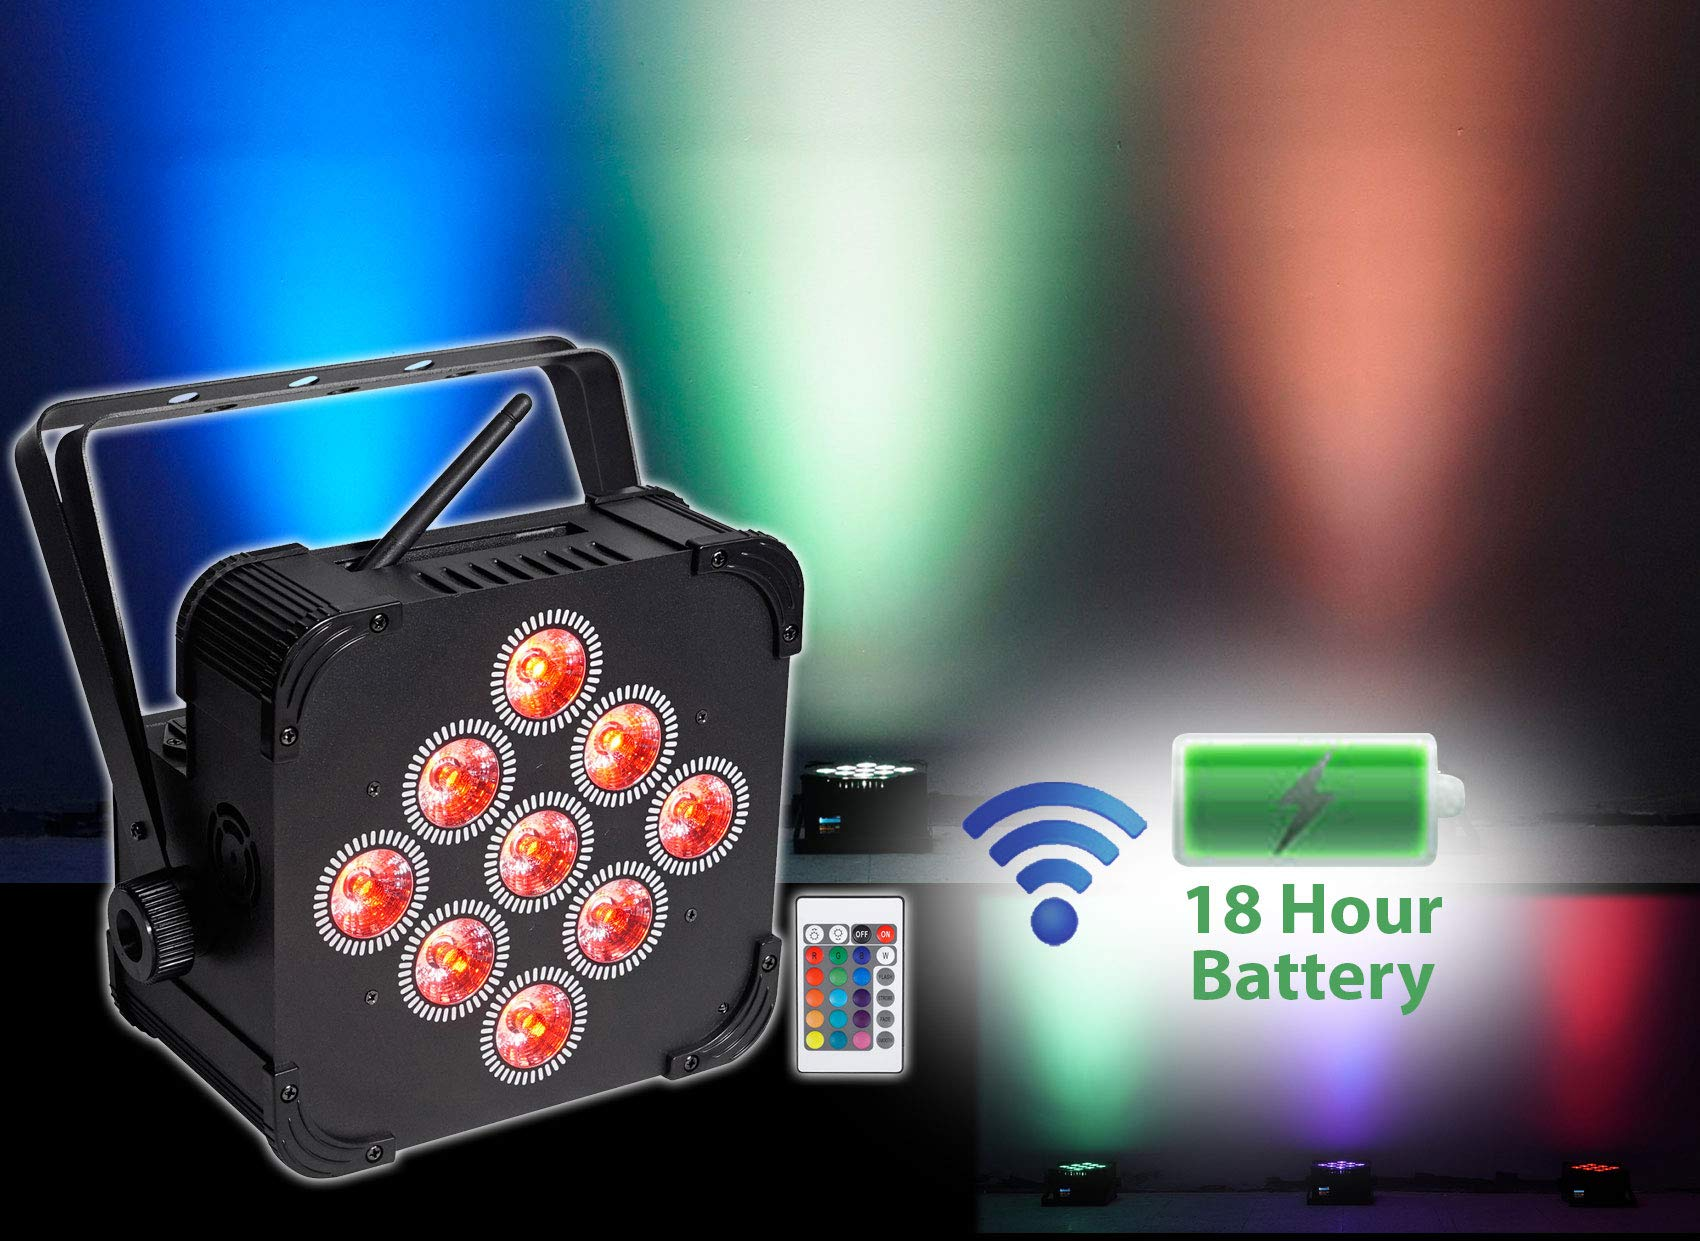 Rockville BEST PAR 60 RGBWA+UV Battery Powered Wash Light w/Wireless DMX+Remote by Rockville